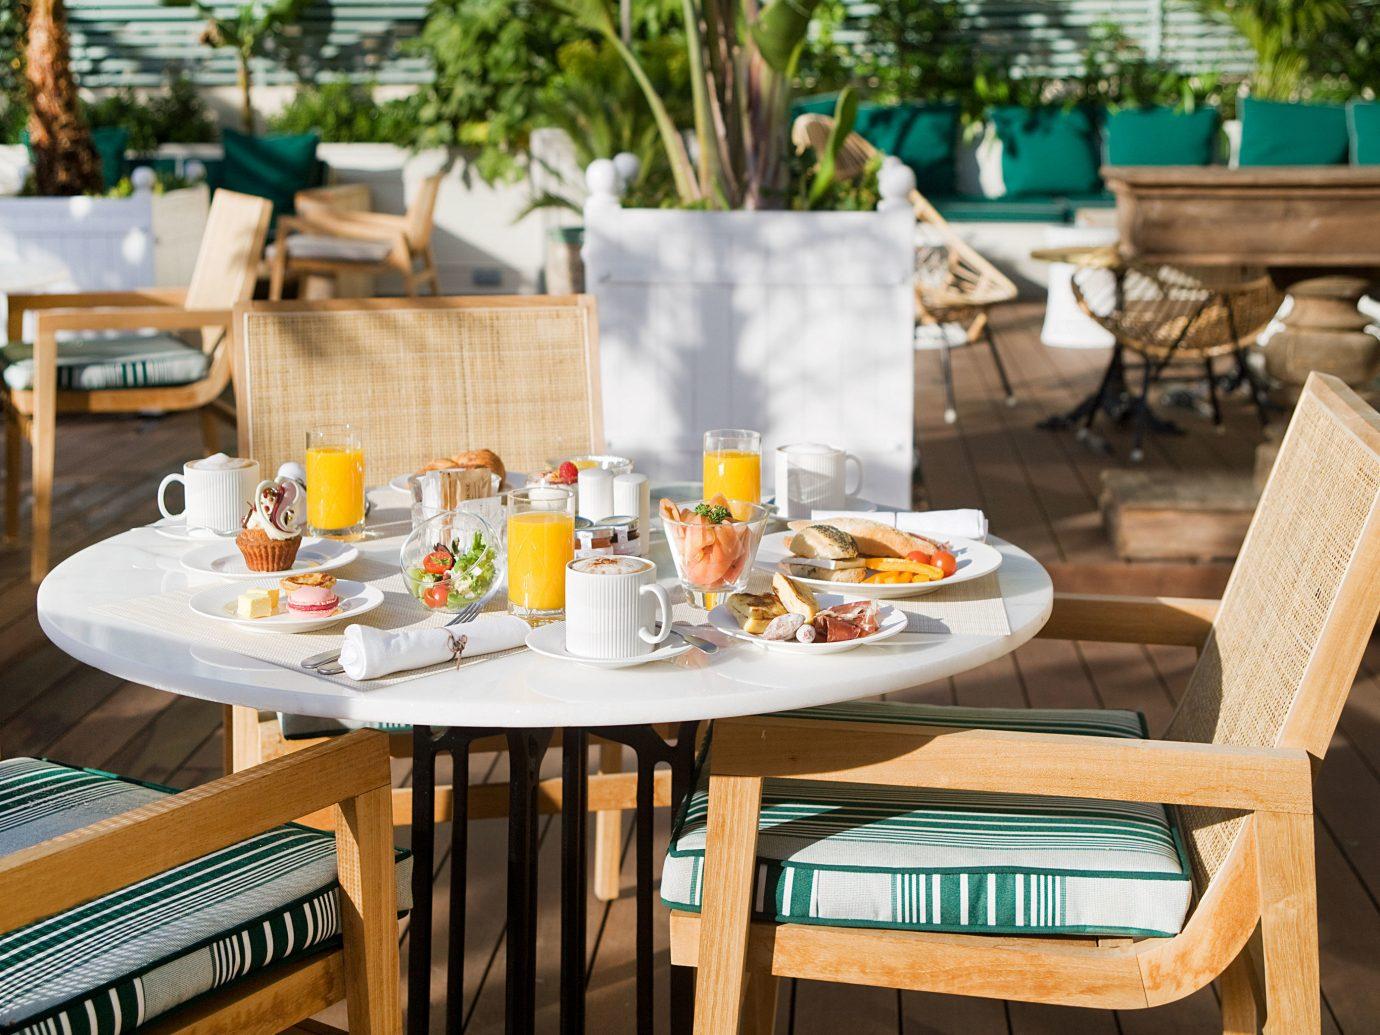 Boutique Hotels Hotels table room restaurant meal Dining brunch lunch interior design Resort dining table